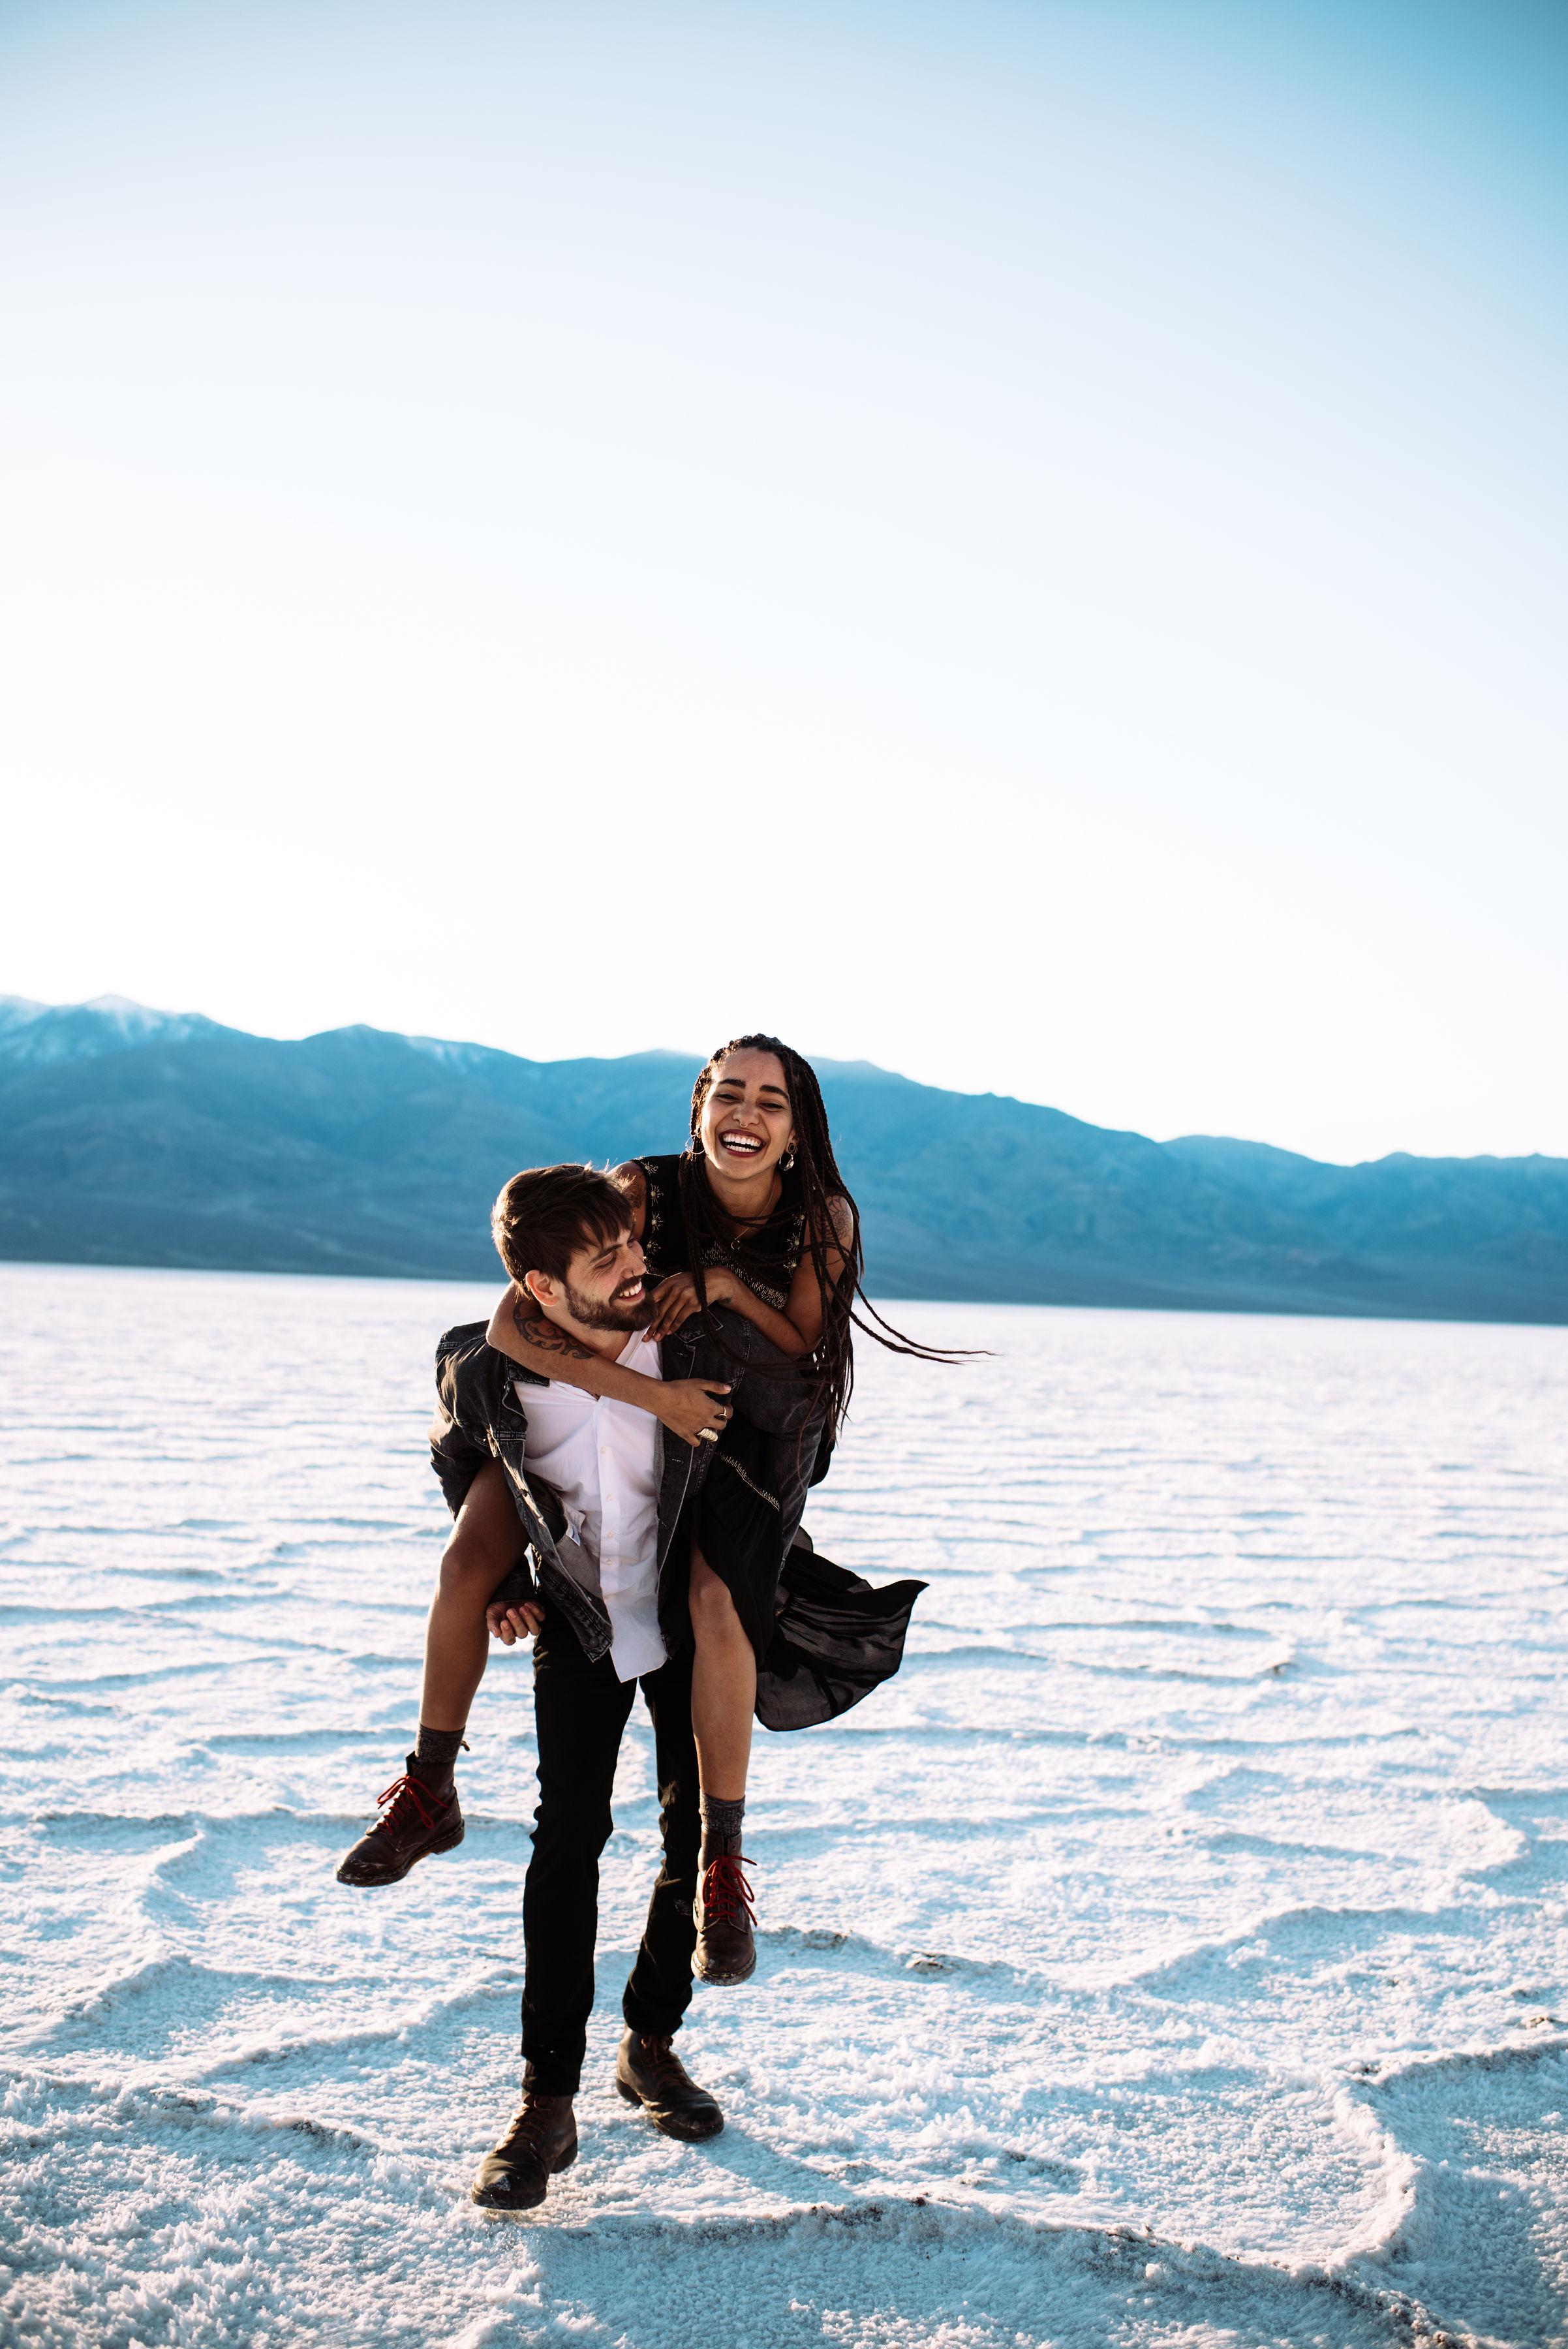 badwater basin elopement - death valley wedding - california wedding photographer - destination wedding photographer - north carolina wedding photographer - three region photography